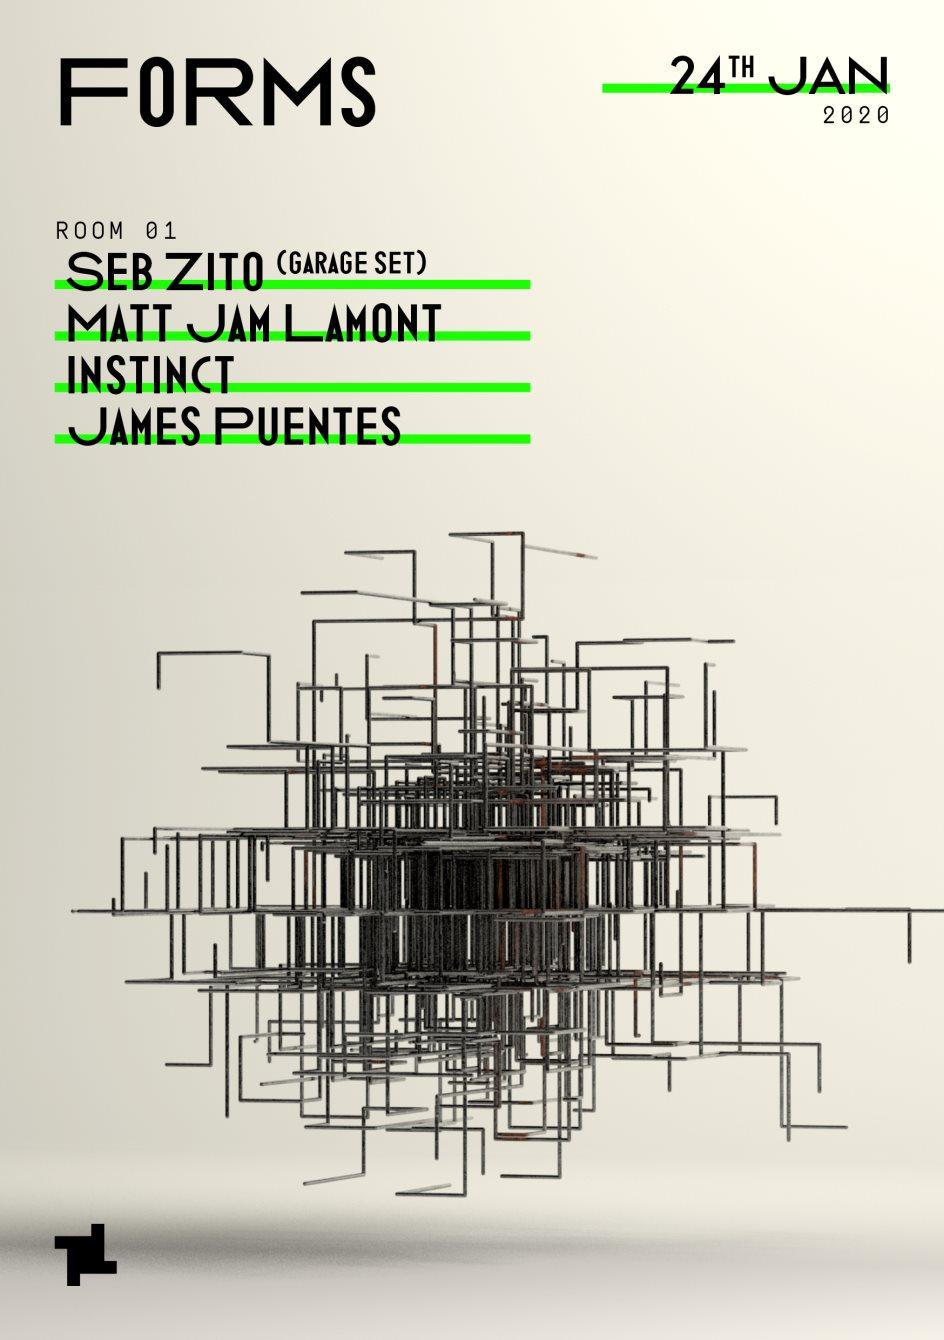 Forms: Seb Zito (Garage Set), Matt Jam Lamont, Instinct & James Puentes - Flyer back